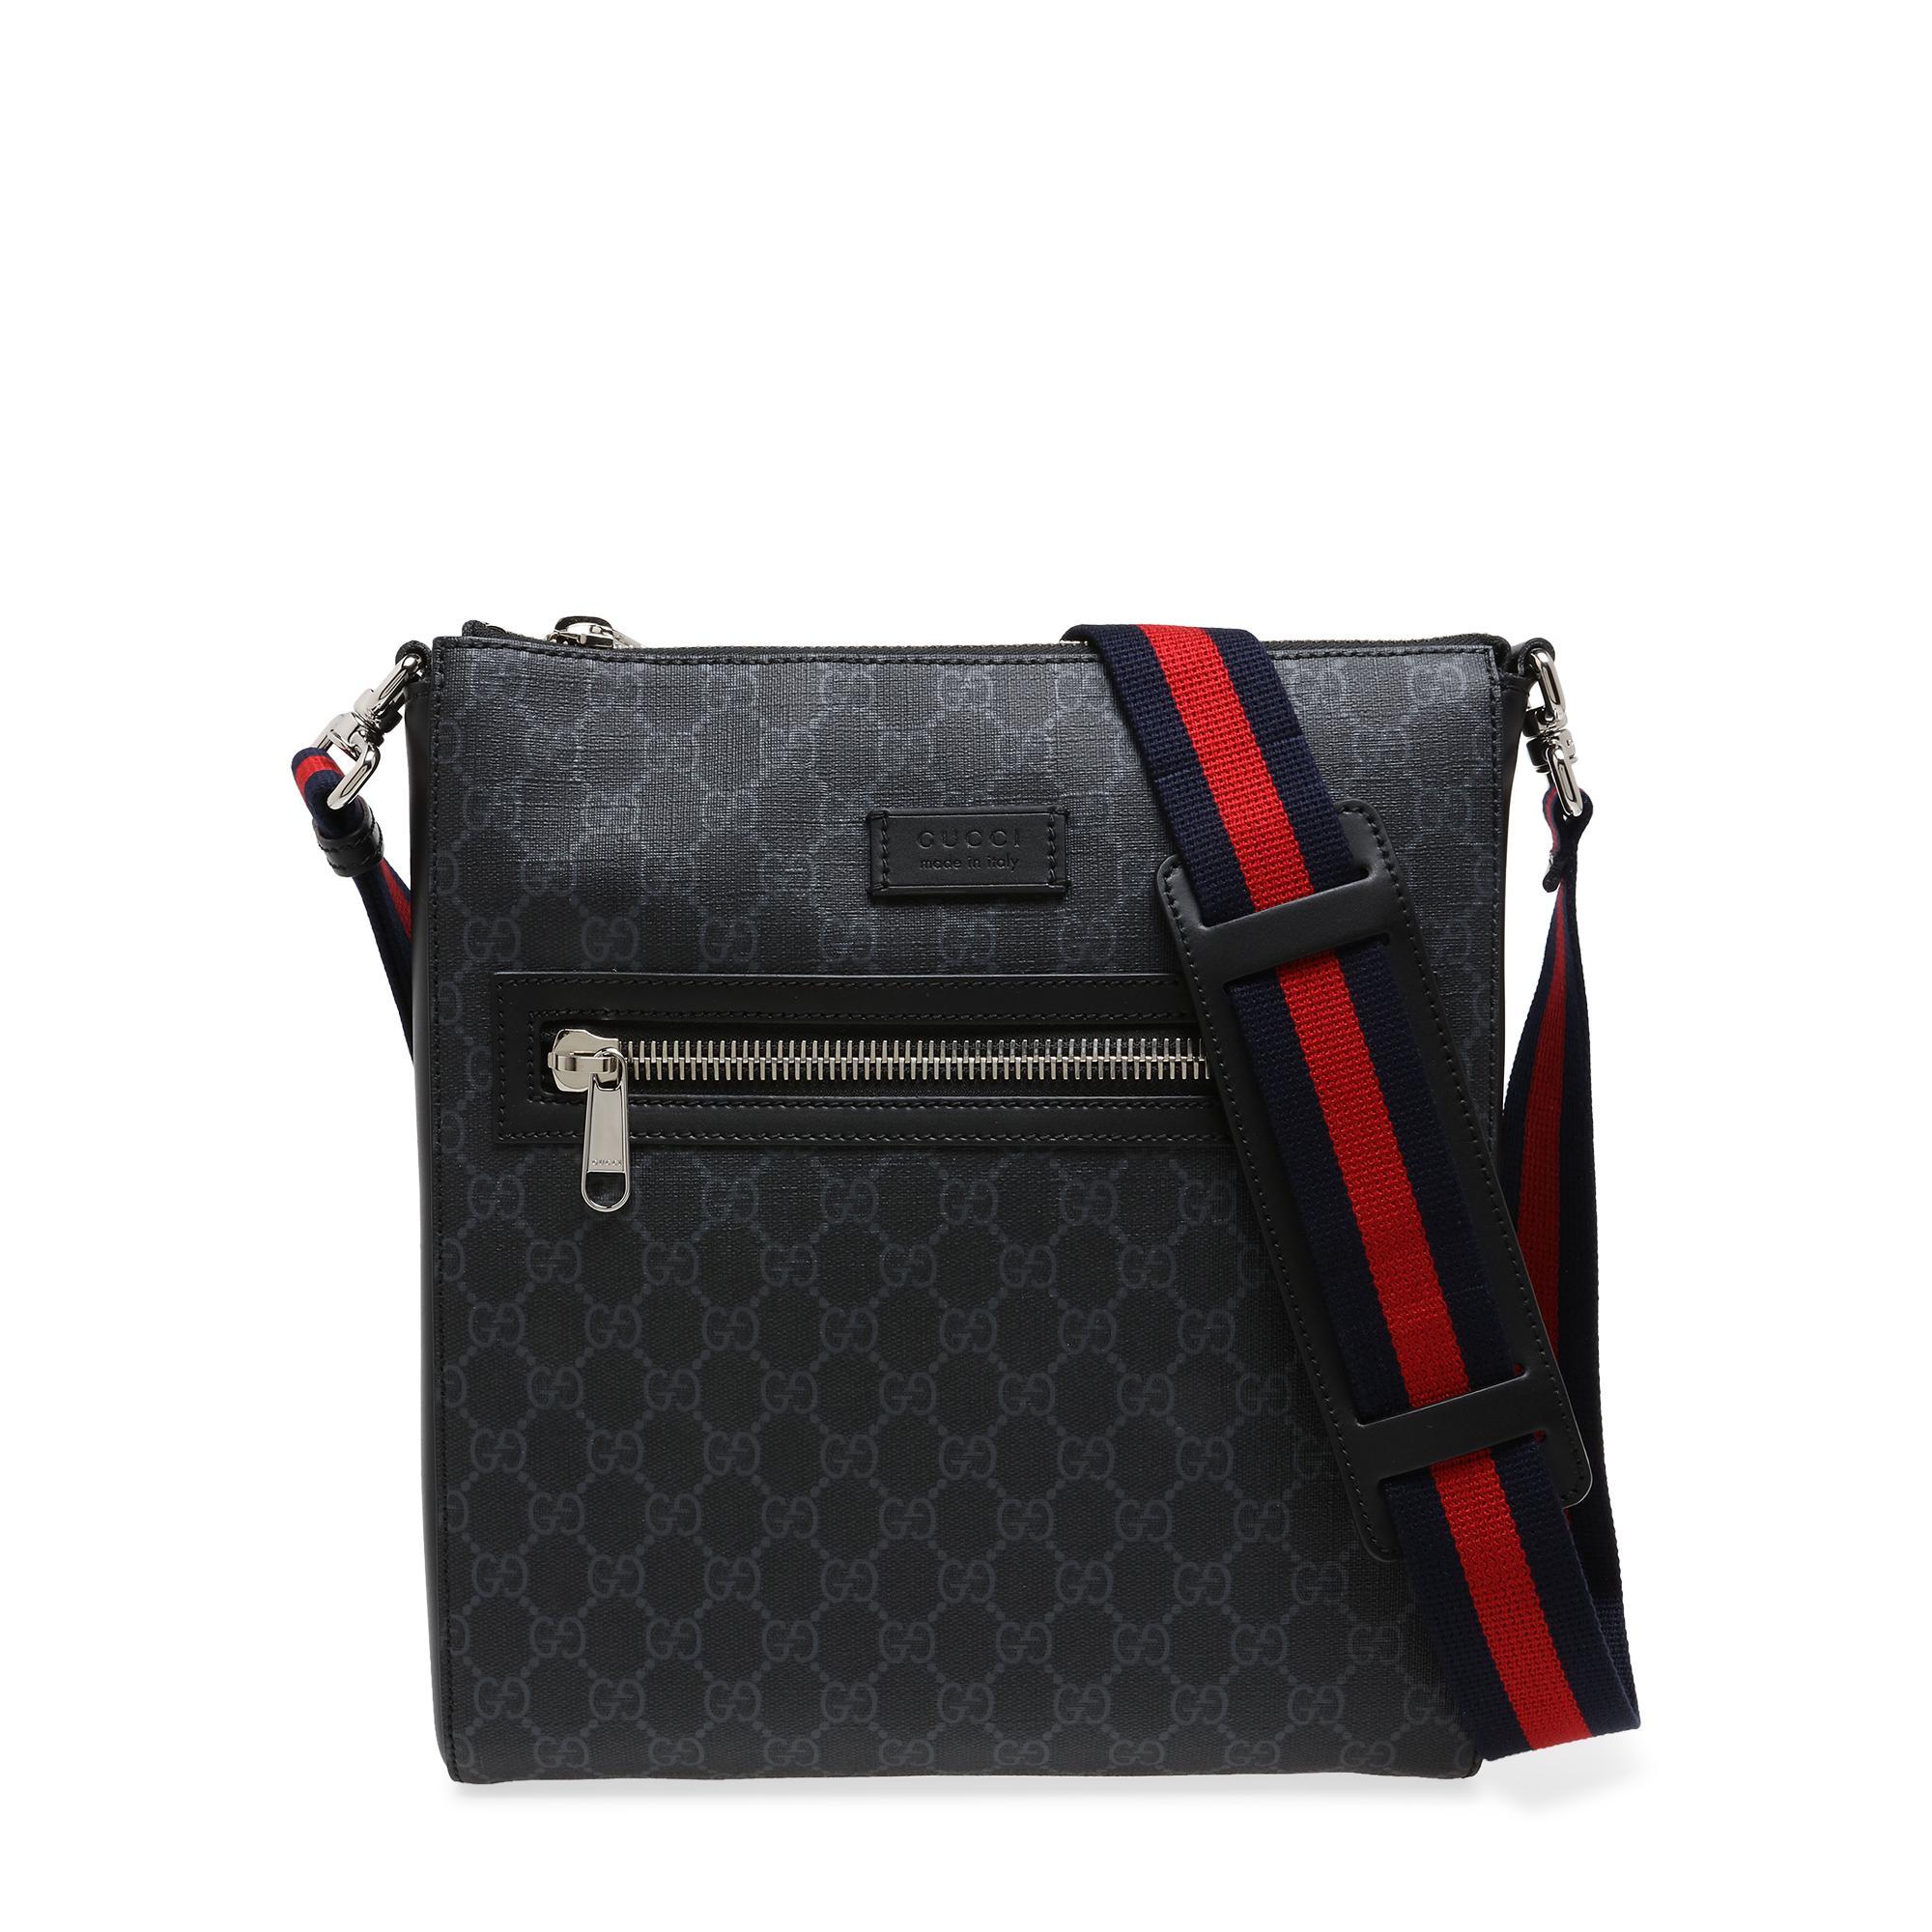 GG messenger bag